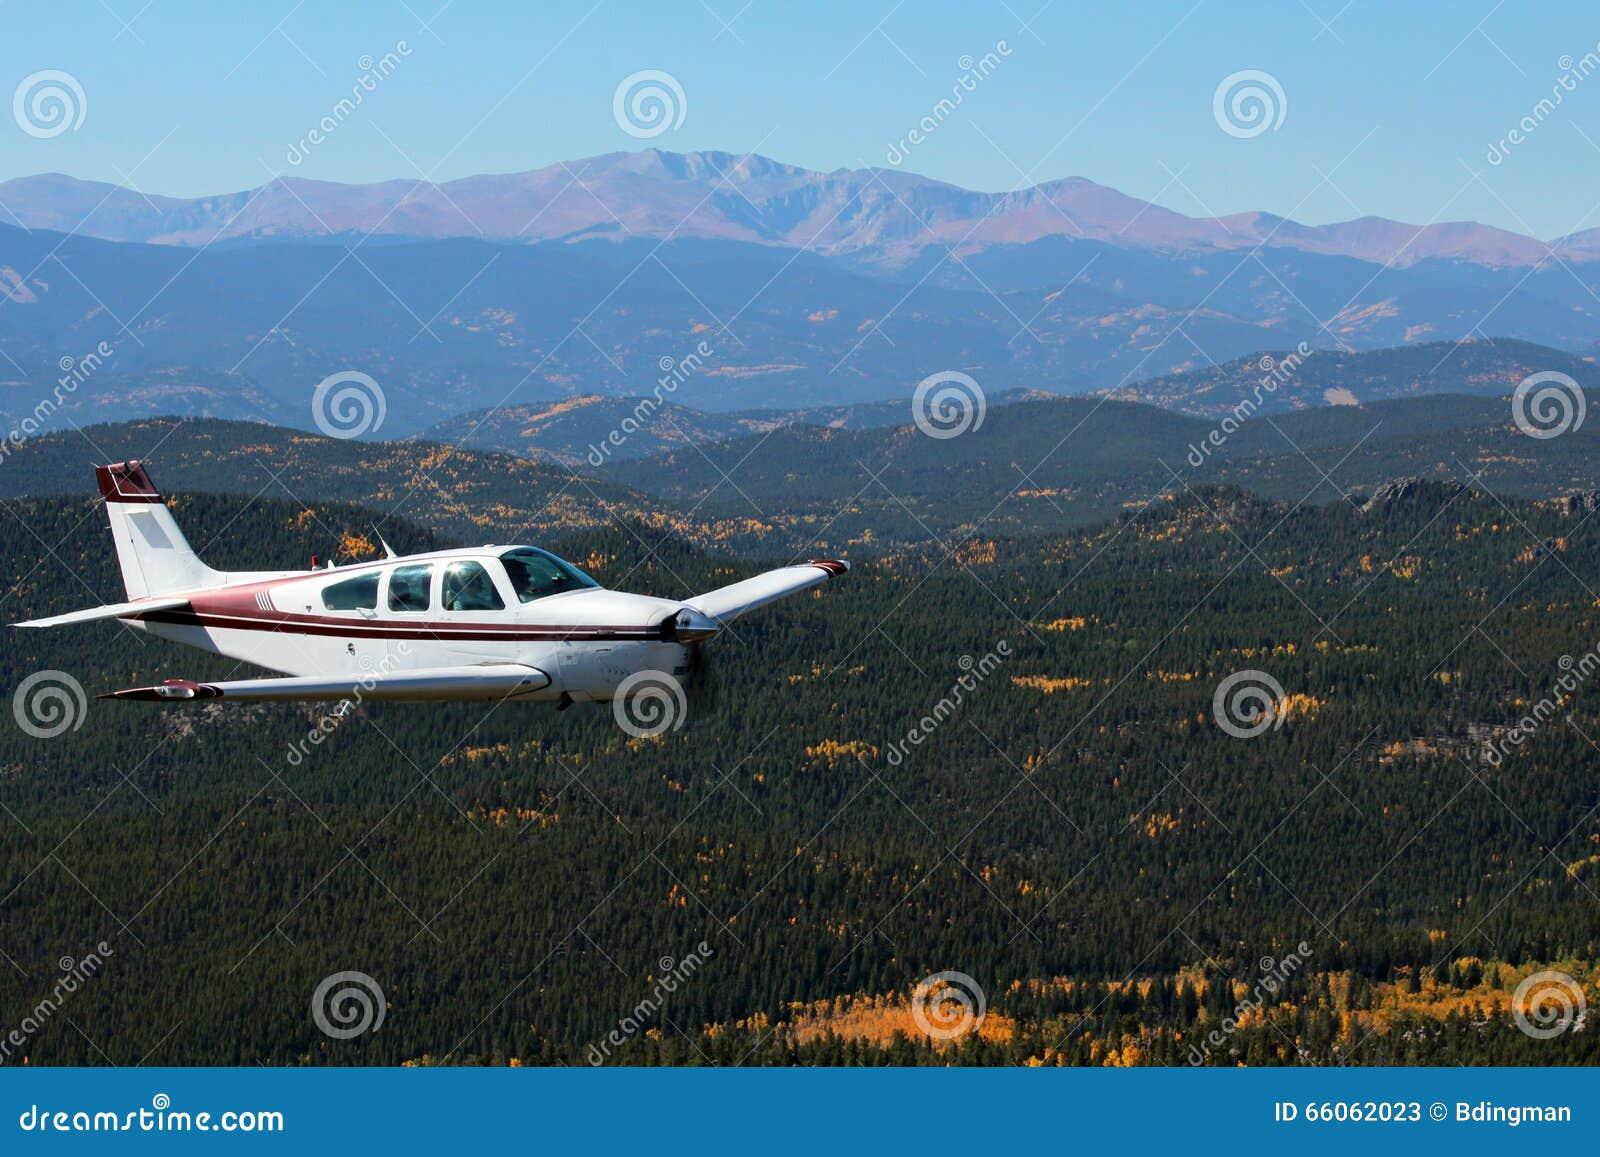 General Aviation - Beechcraft Bonanza Stock Image - Image of flight